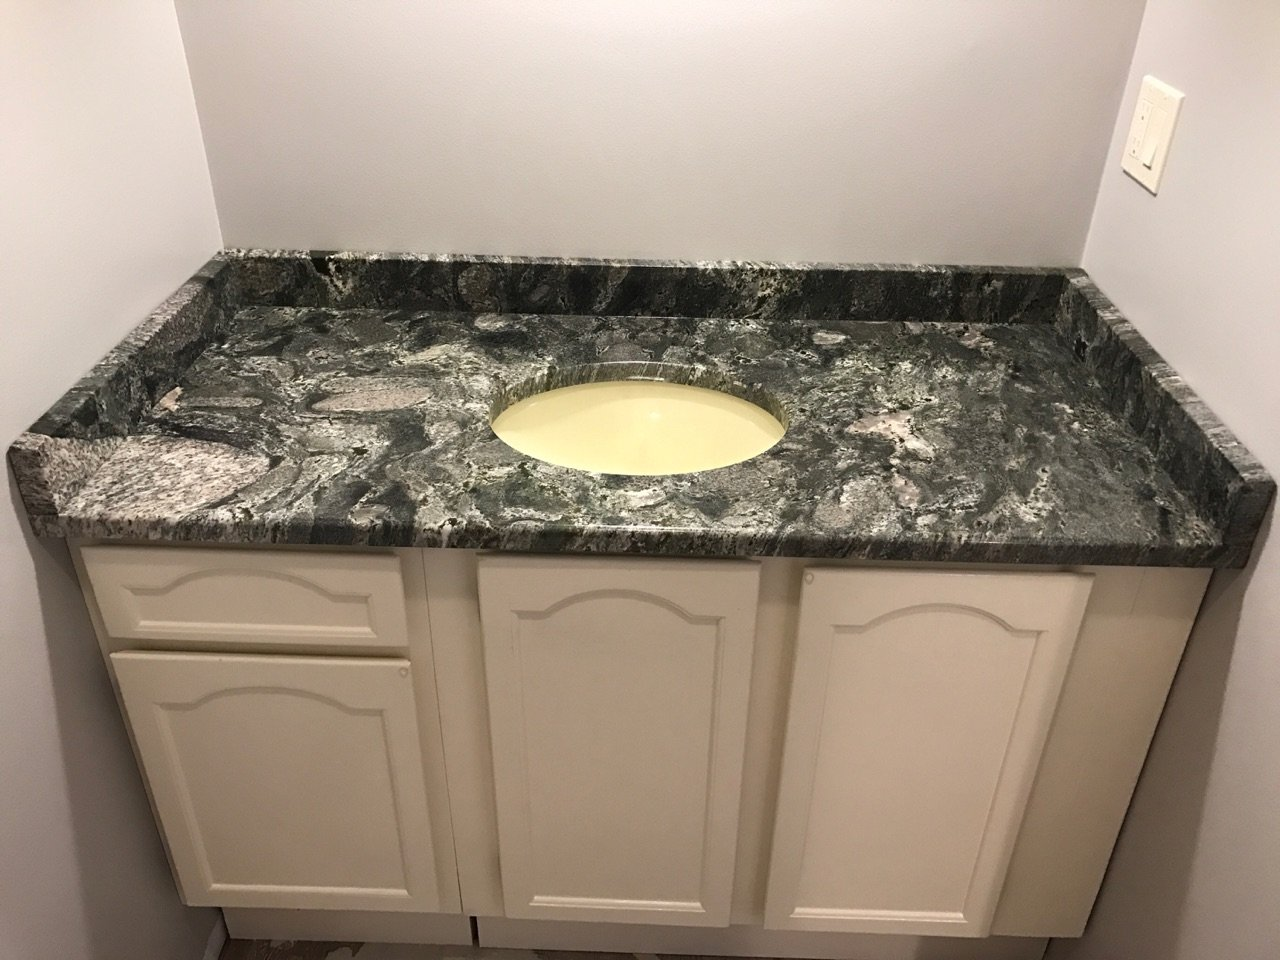 Bathroom Counter Design Amherst NY